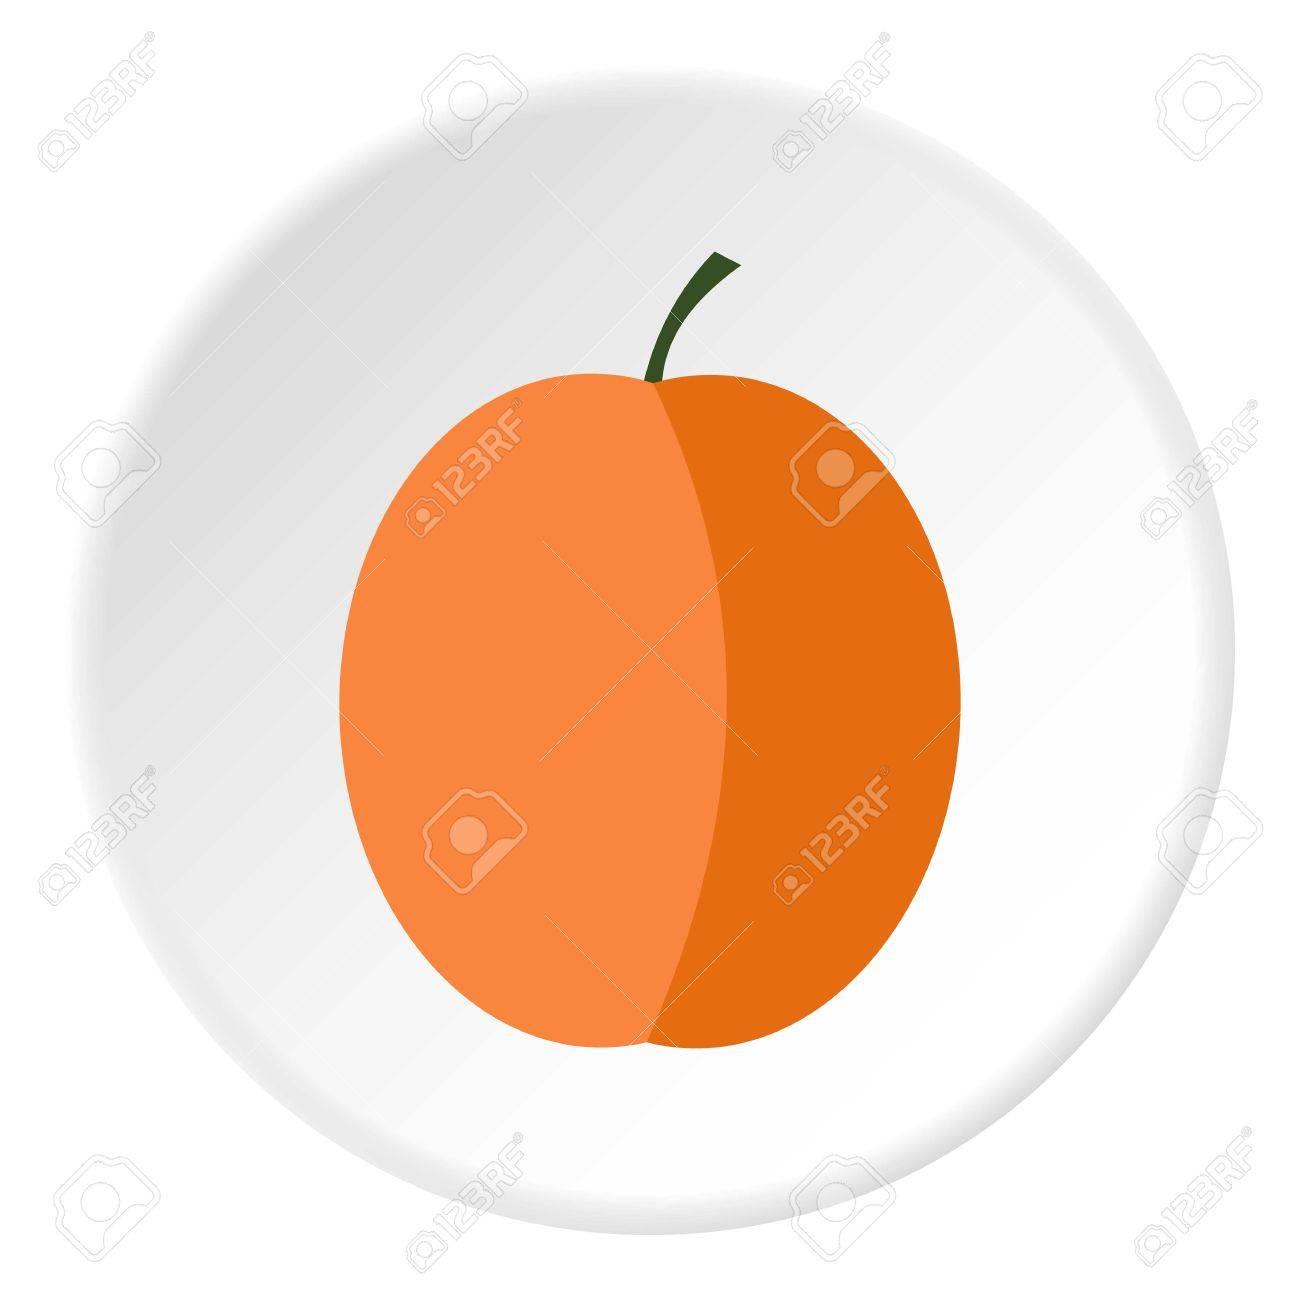 Peach icon. Flat illustration of peach vector icon for web - 64404238